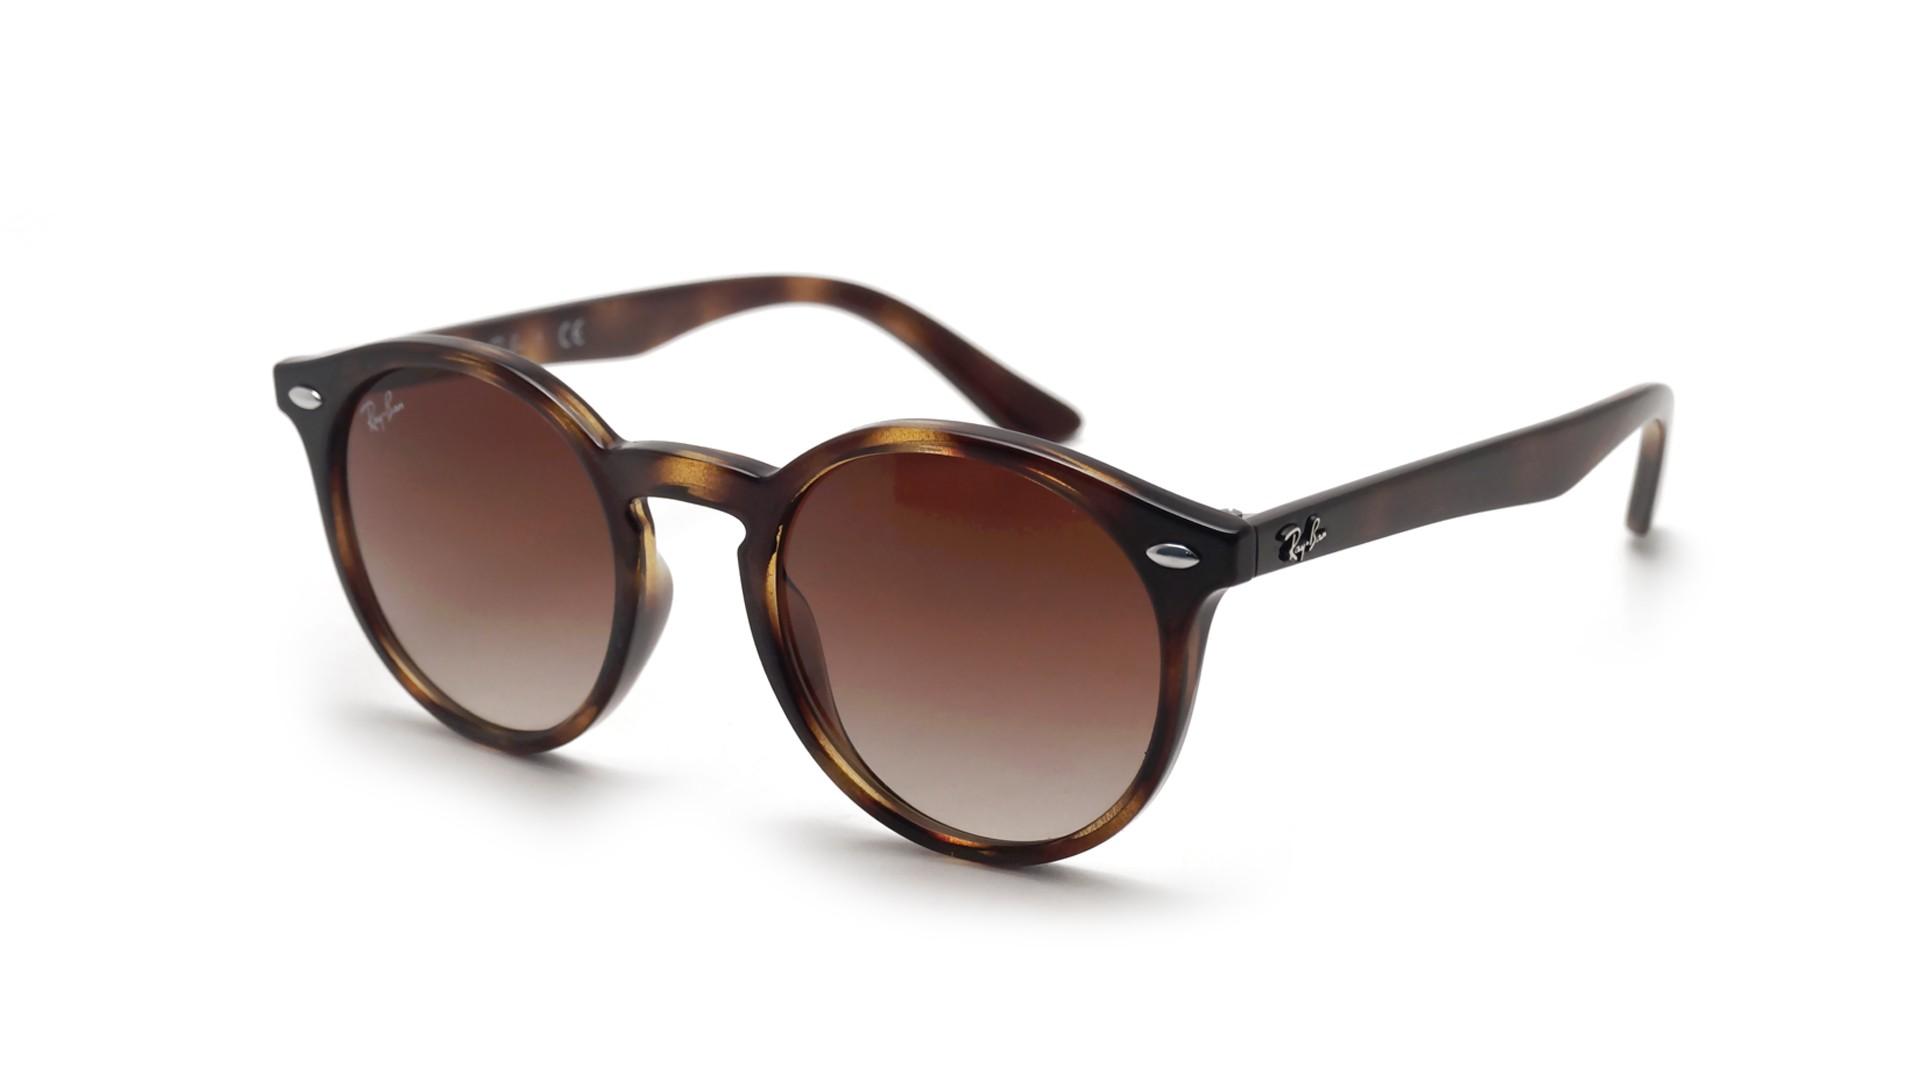 7cc2cc75f94 Sunglasses Ray-Ban RJ9064S 152 13 44-19 Tortoise Junior Gradient